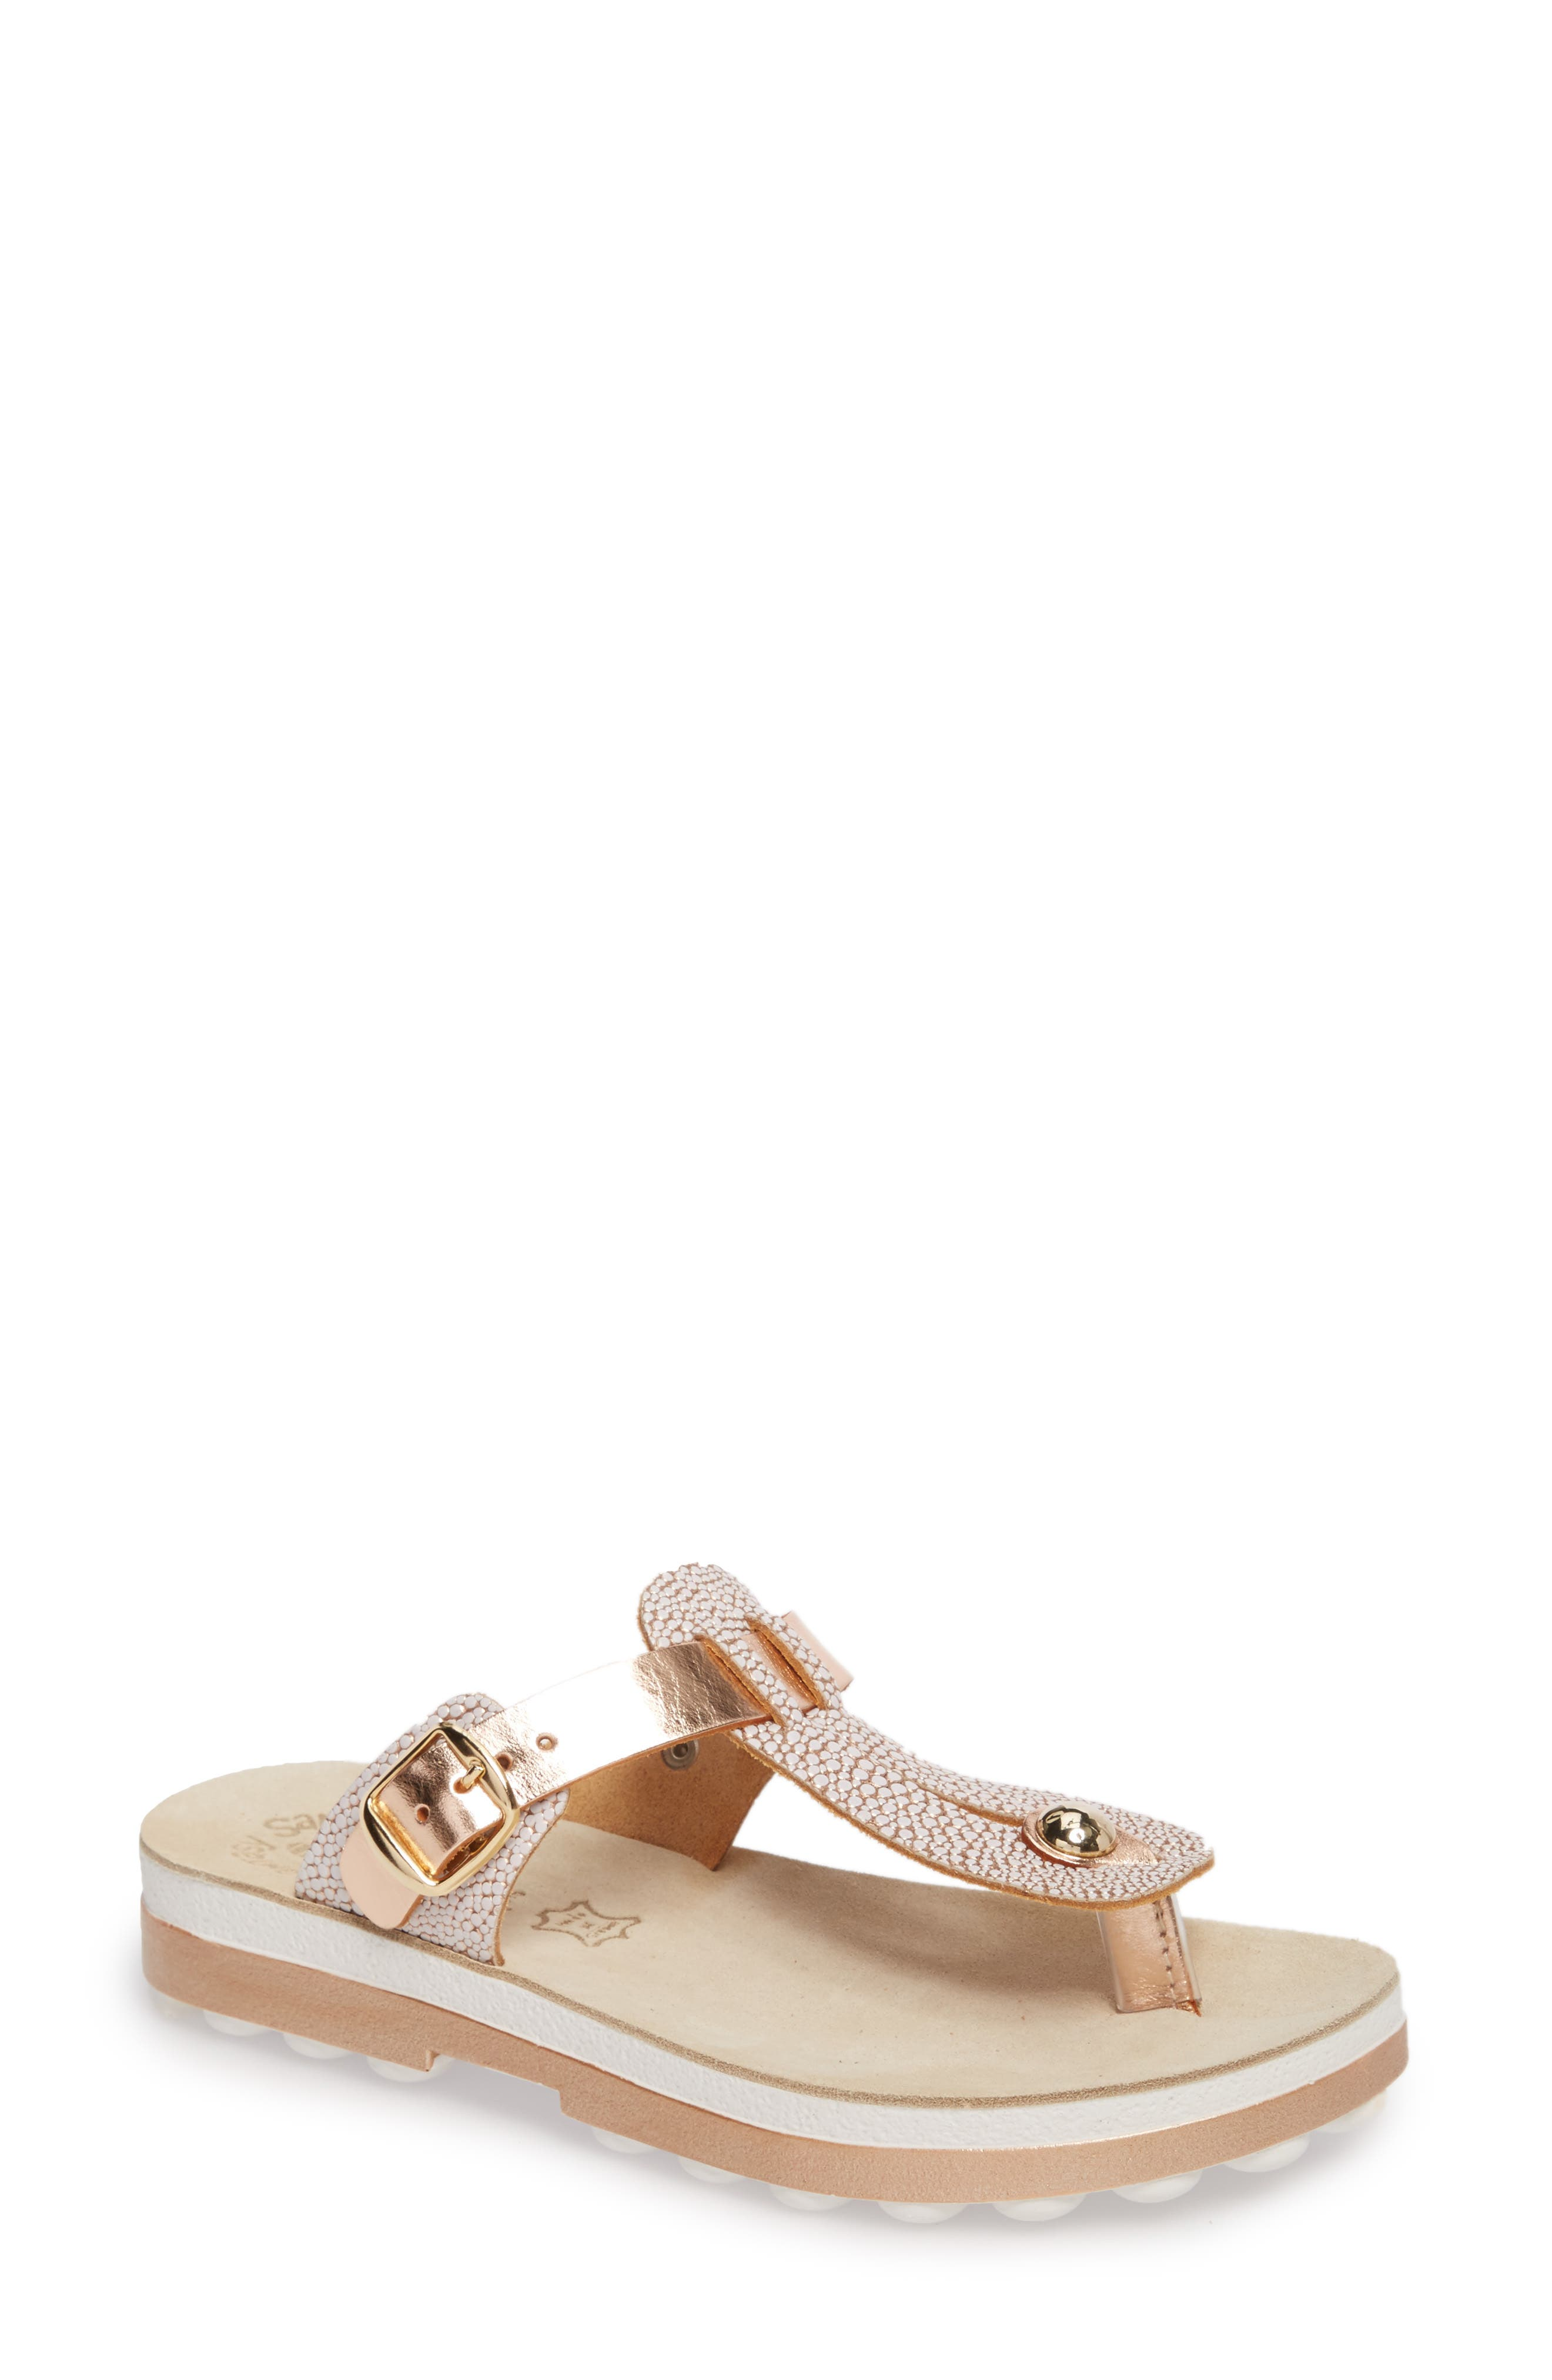 Fantasy Sandals Flip-Flops for Women